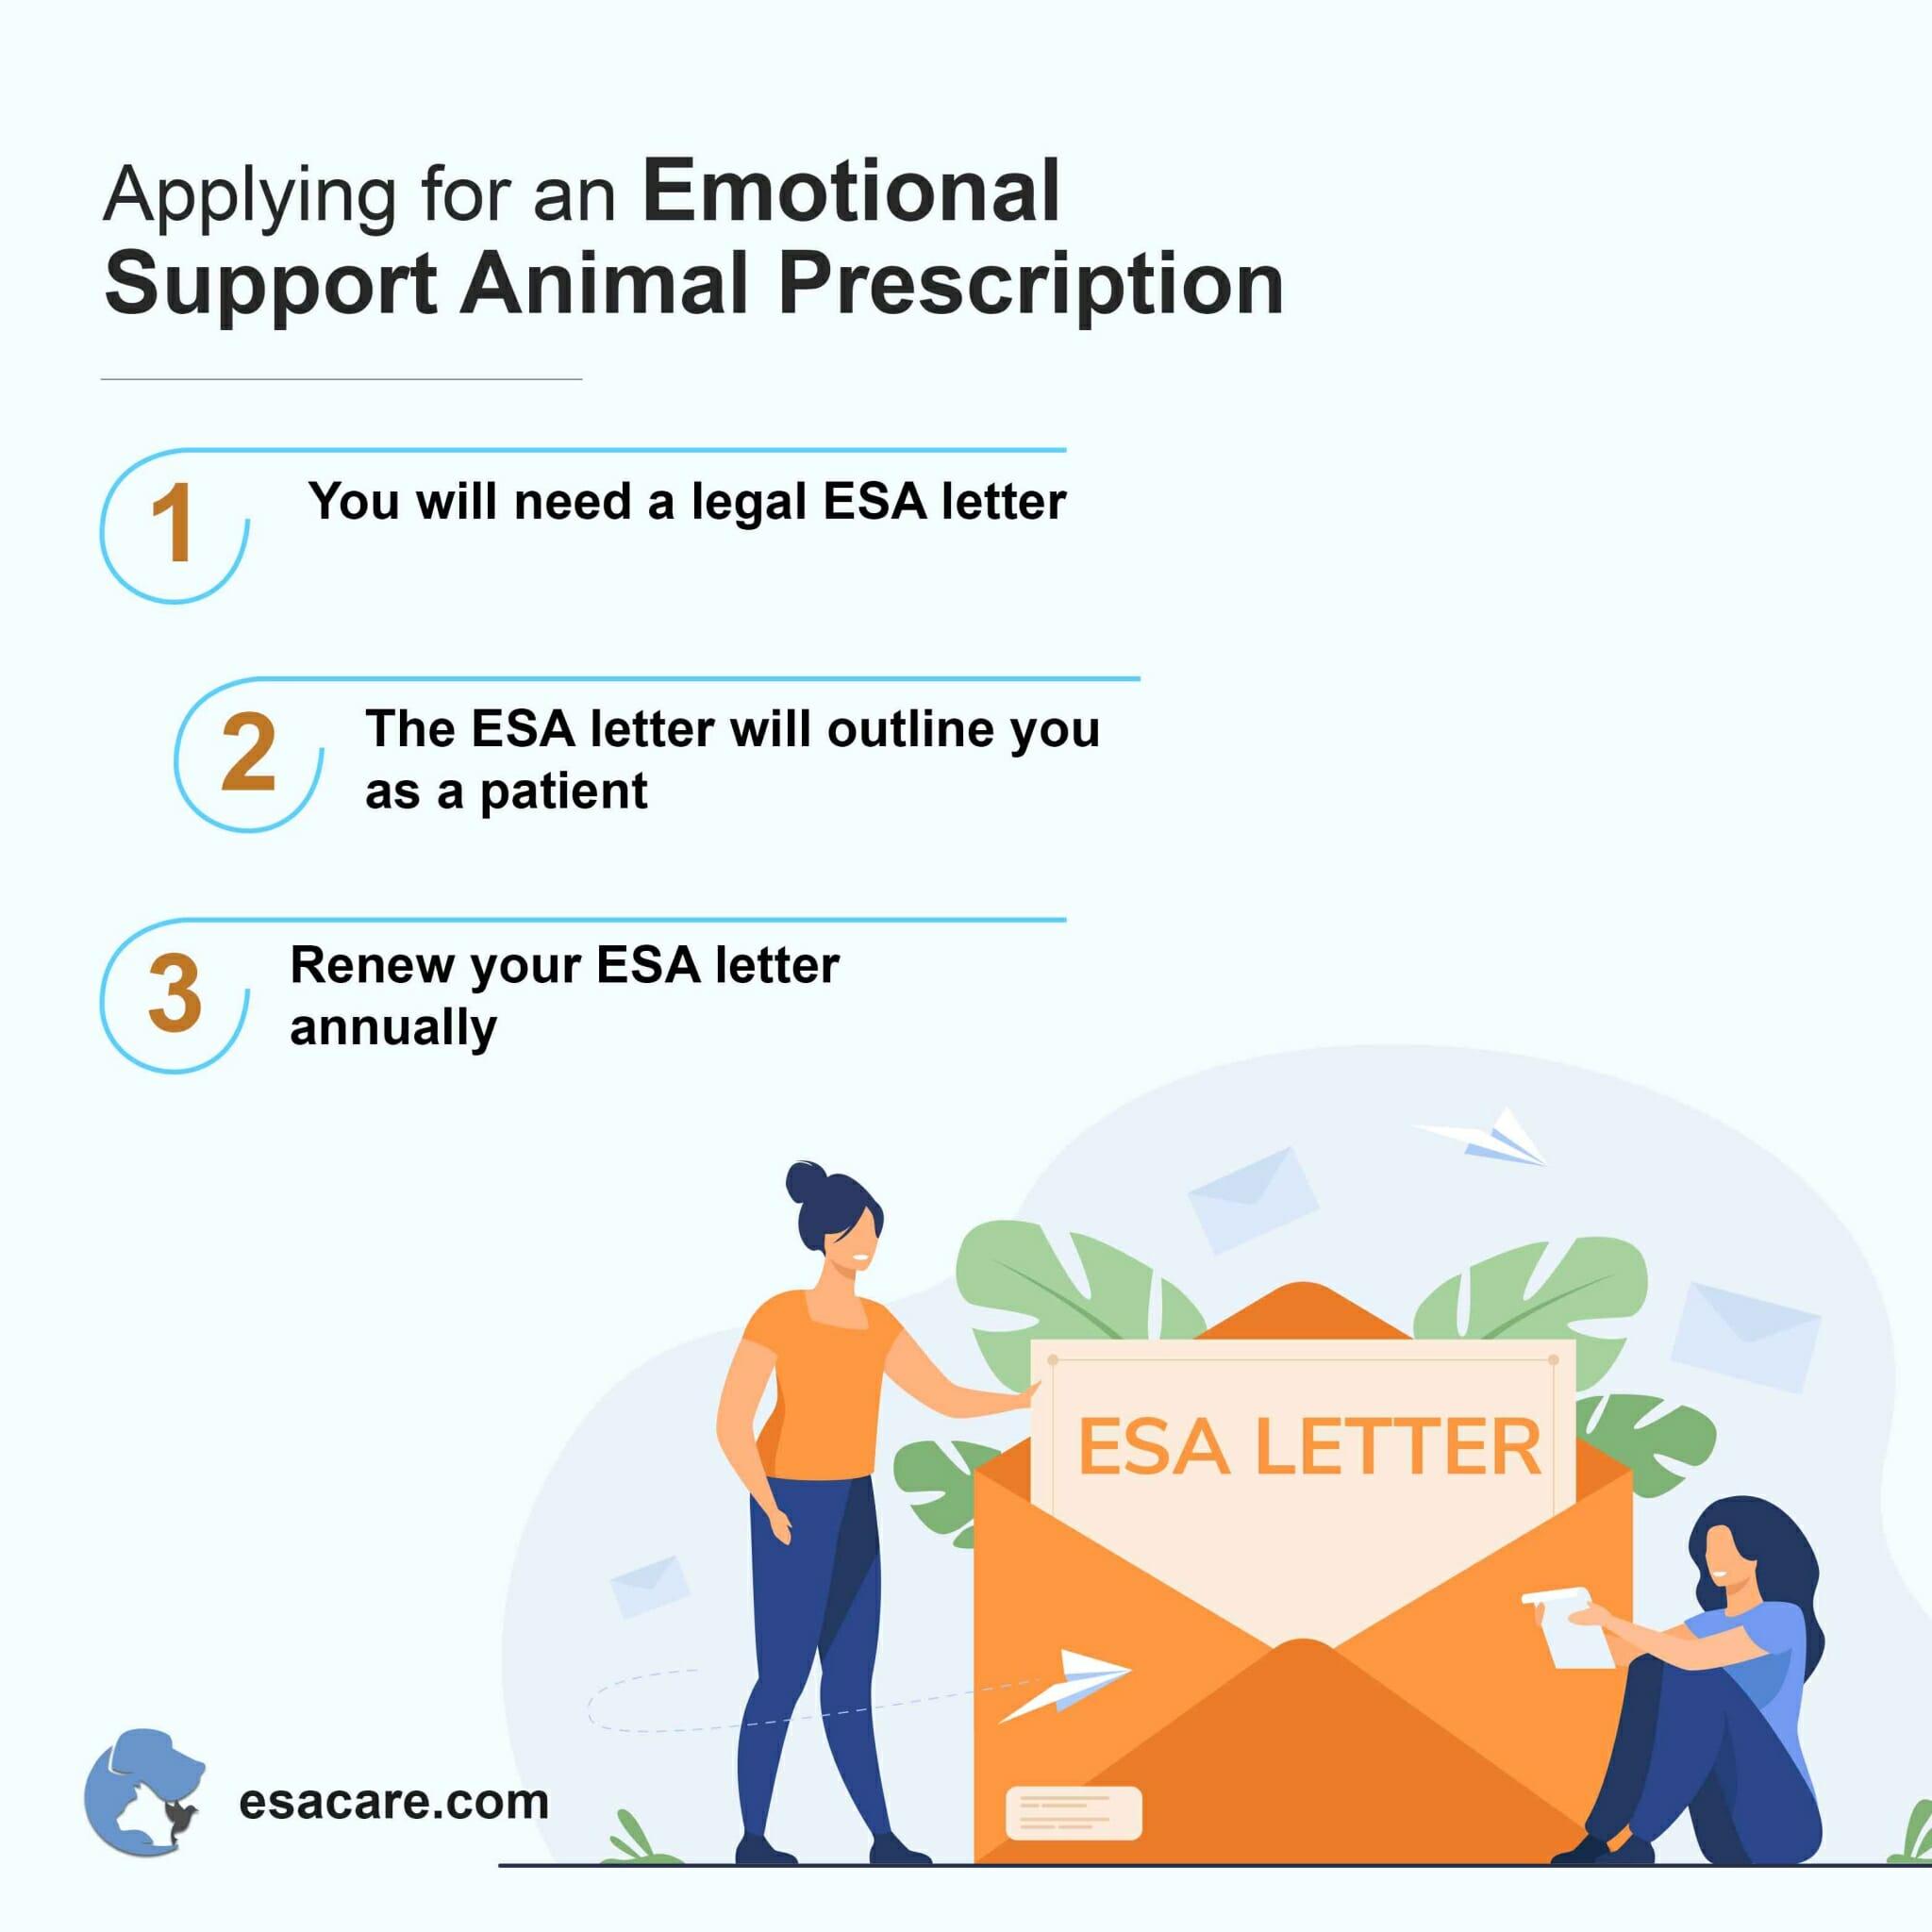 Emotional support animal prescription